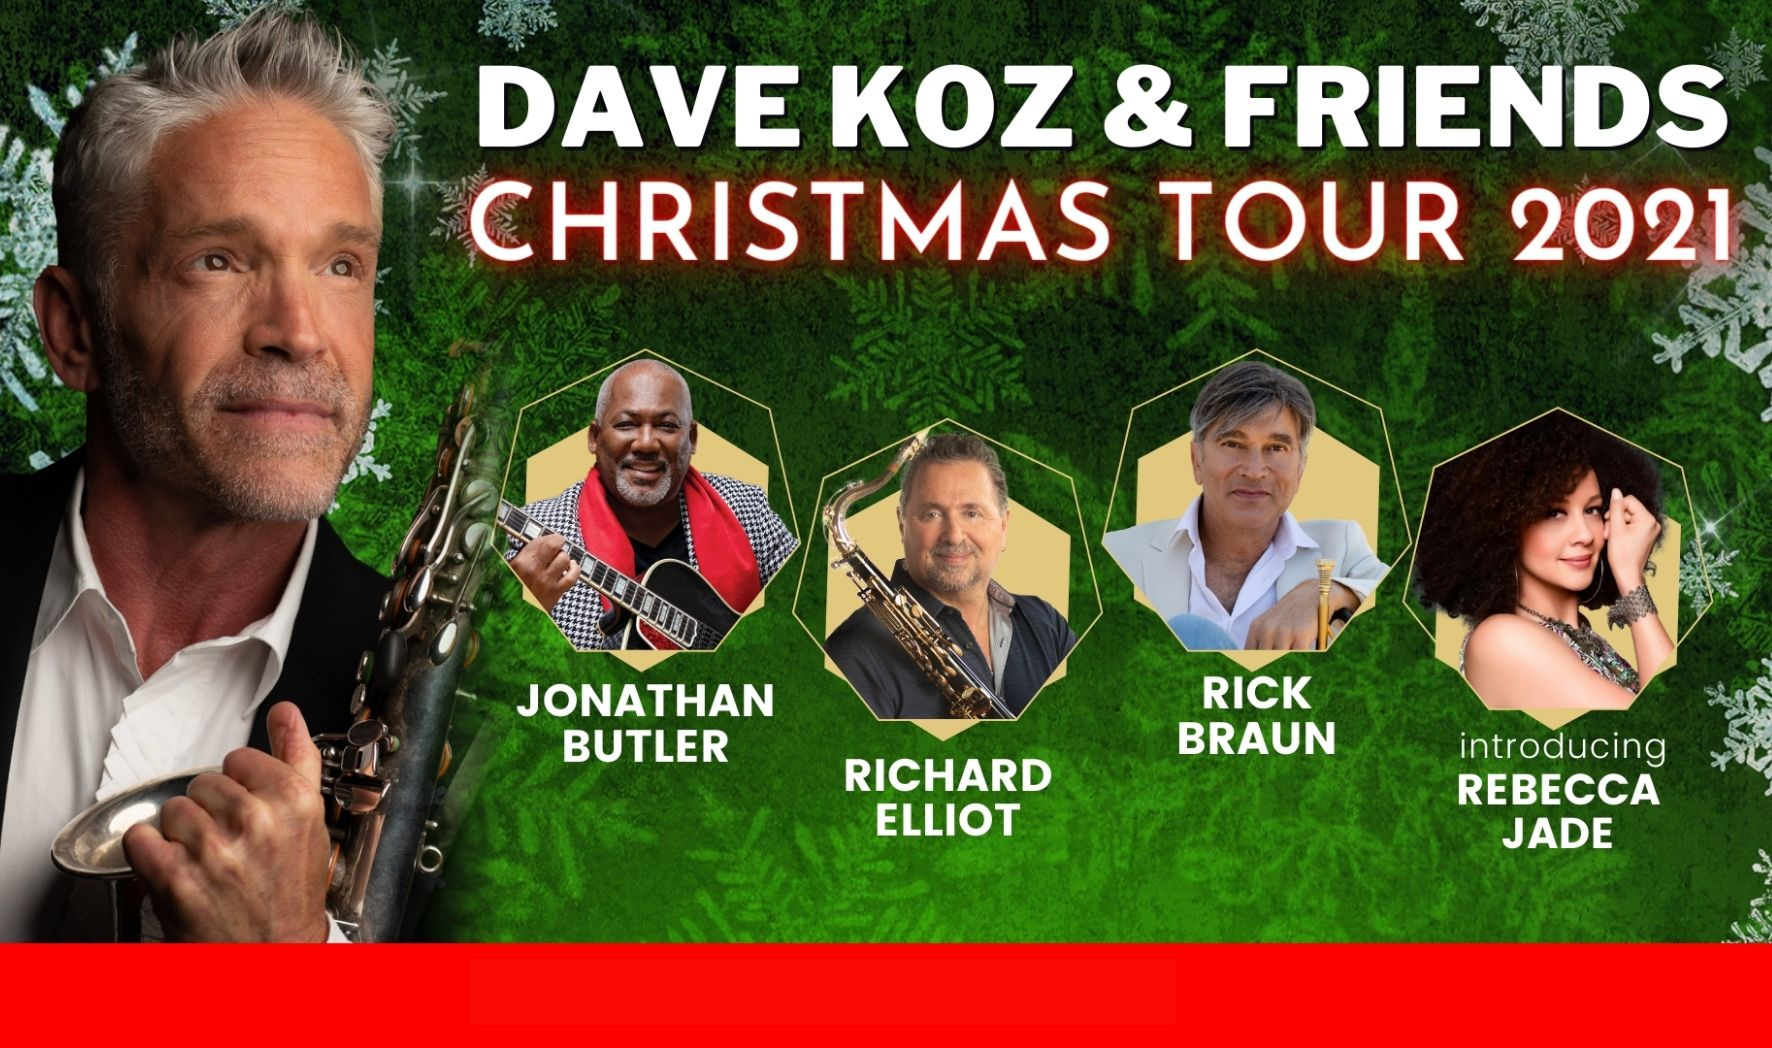 Dave Koz & Friends Christmas Tour 2021